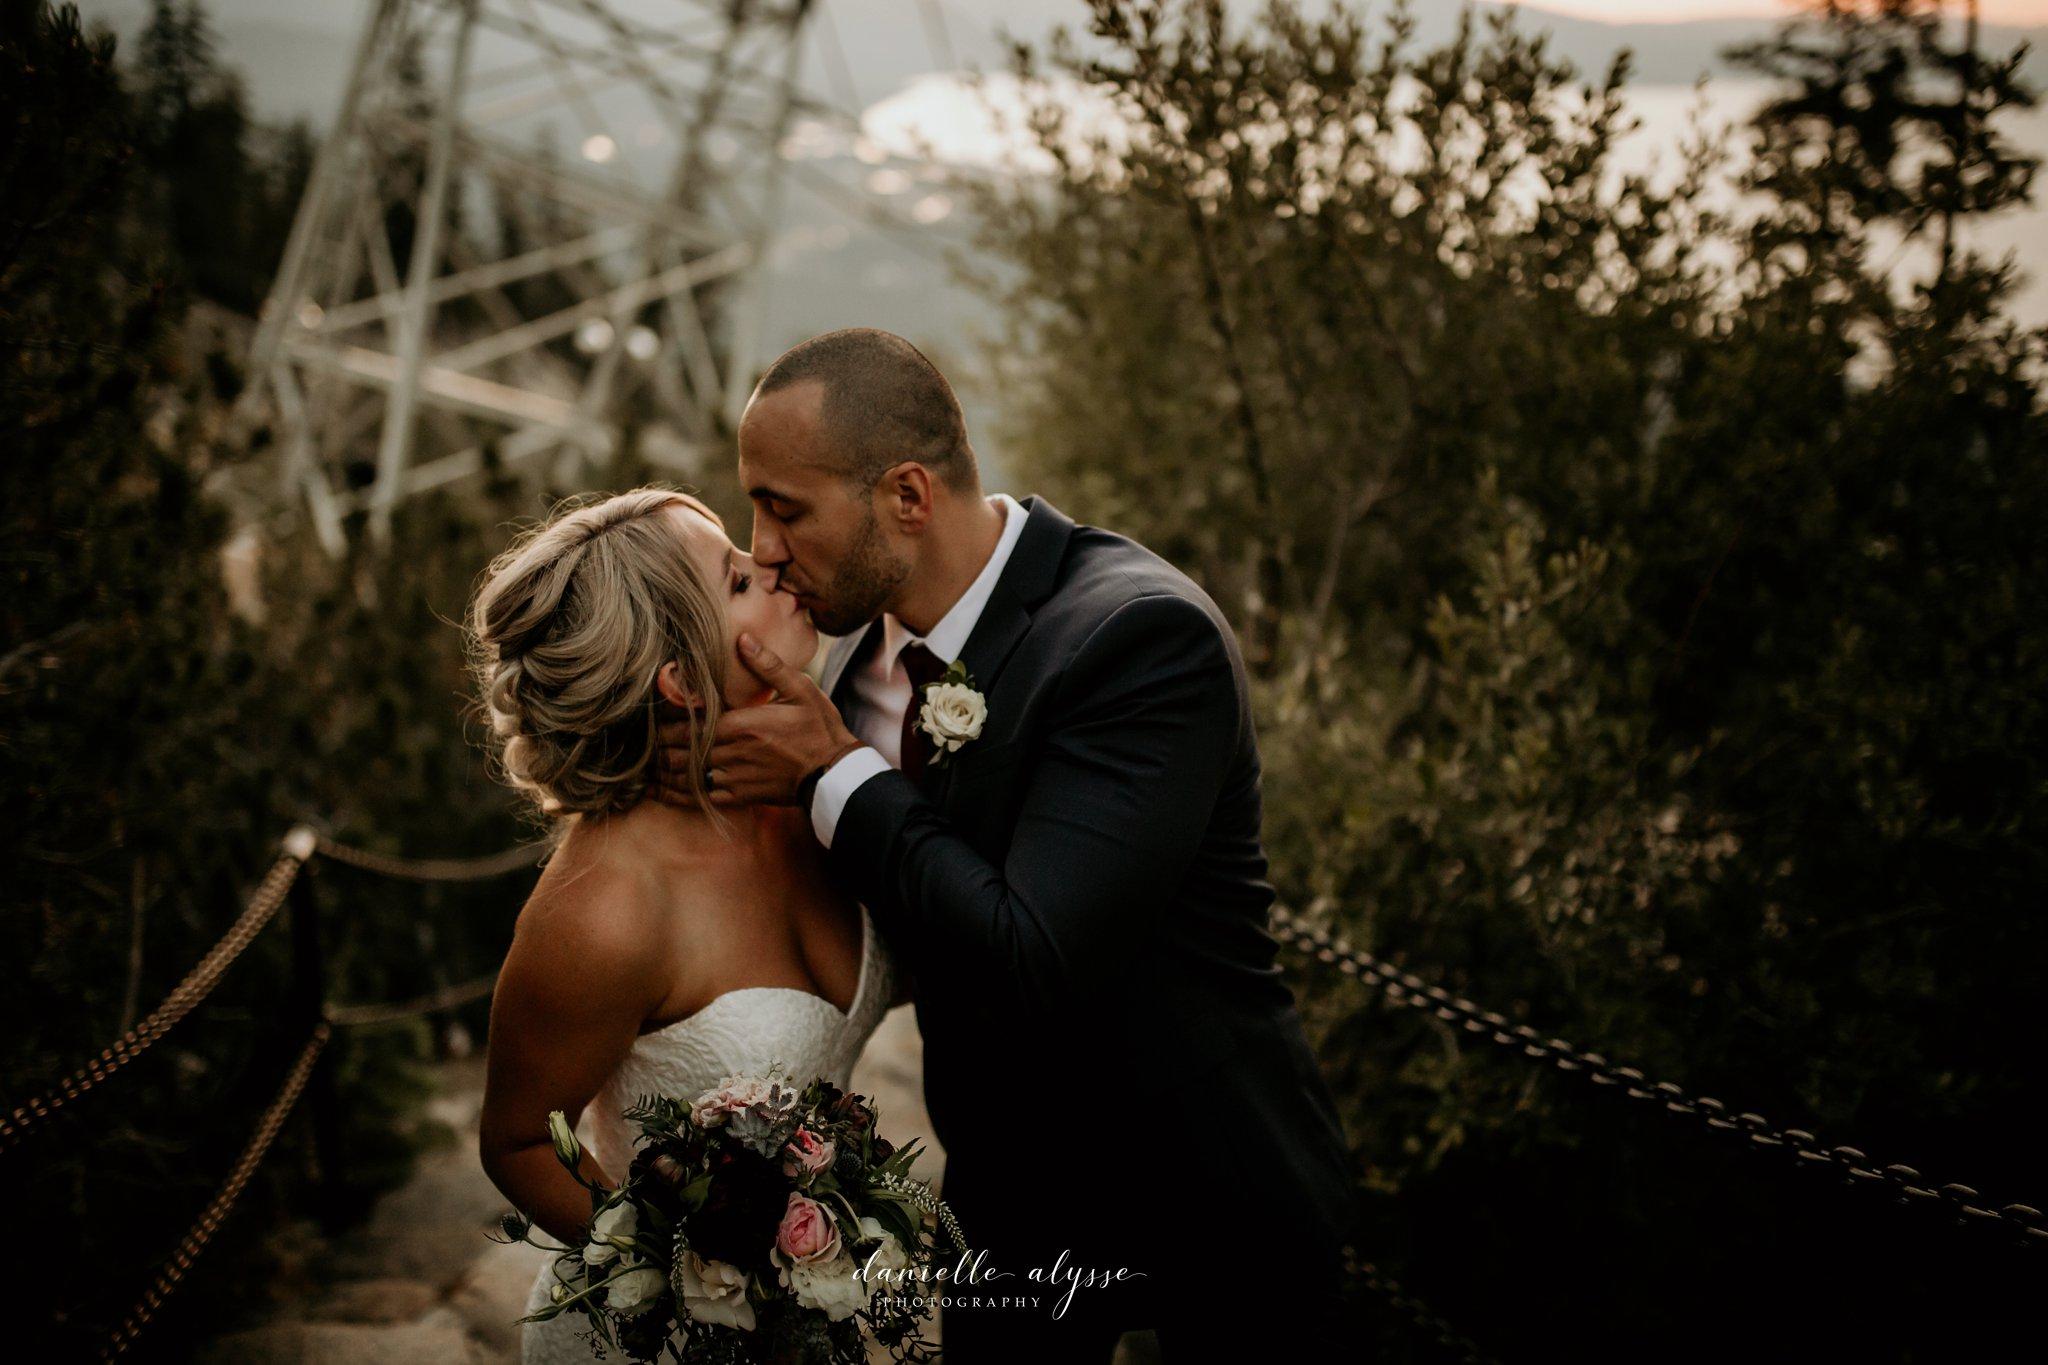 180831_wedding_stephanie_heavenly_south_lake_tahoe_danielle_alysse_photography_destination_blog_1048_WEB.jpg